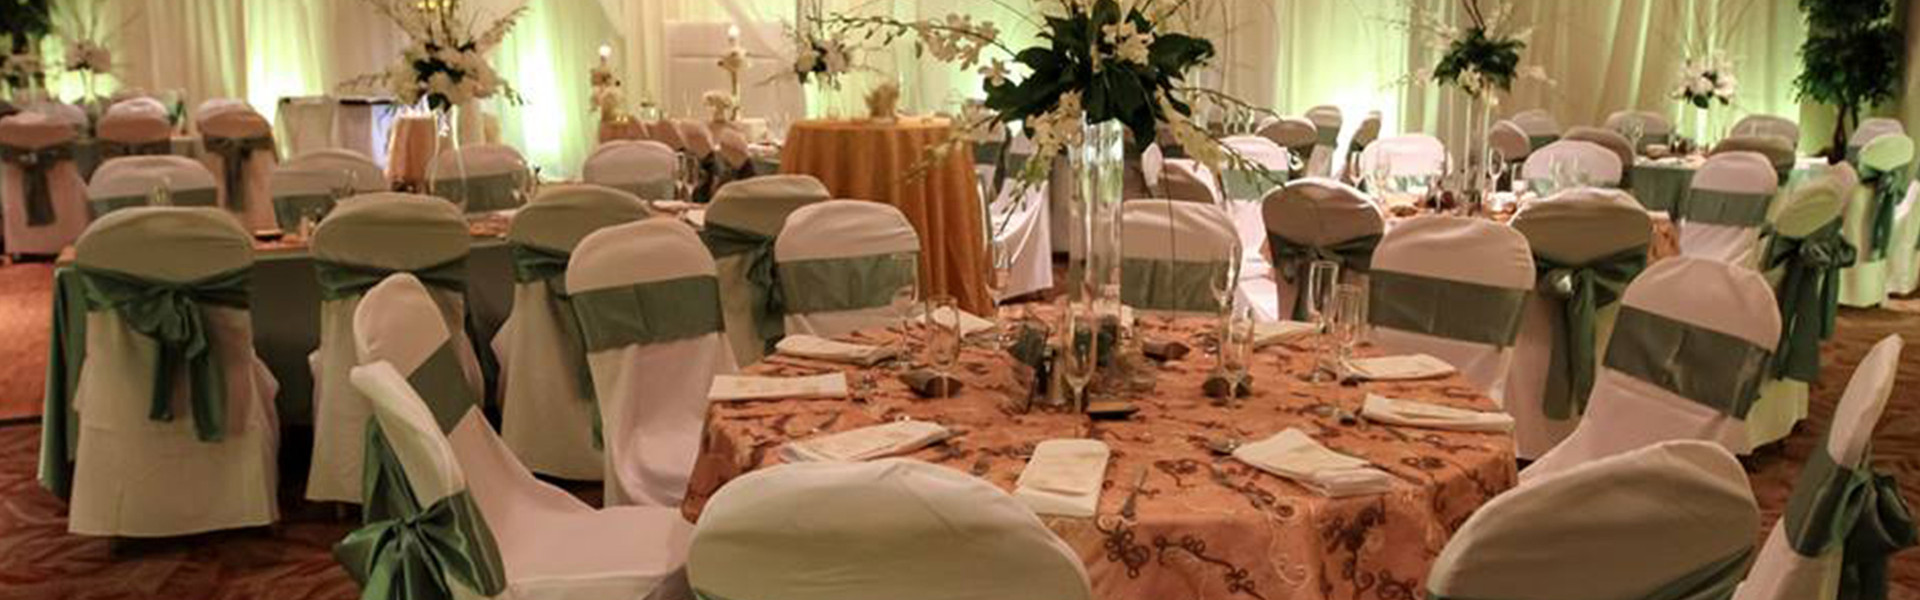 Wedding Options in Las Vegas NV | Westgate Las Vegas Resort & Casino